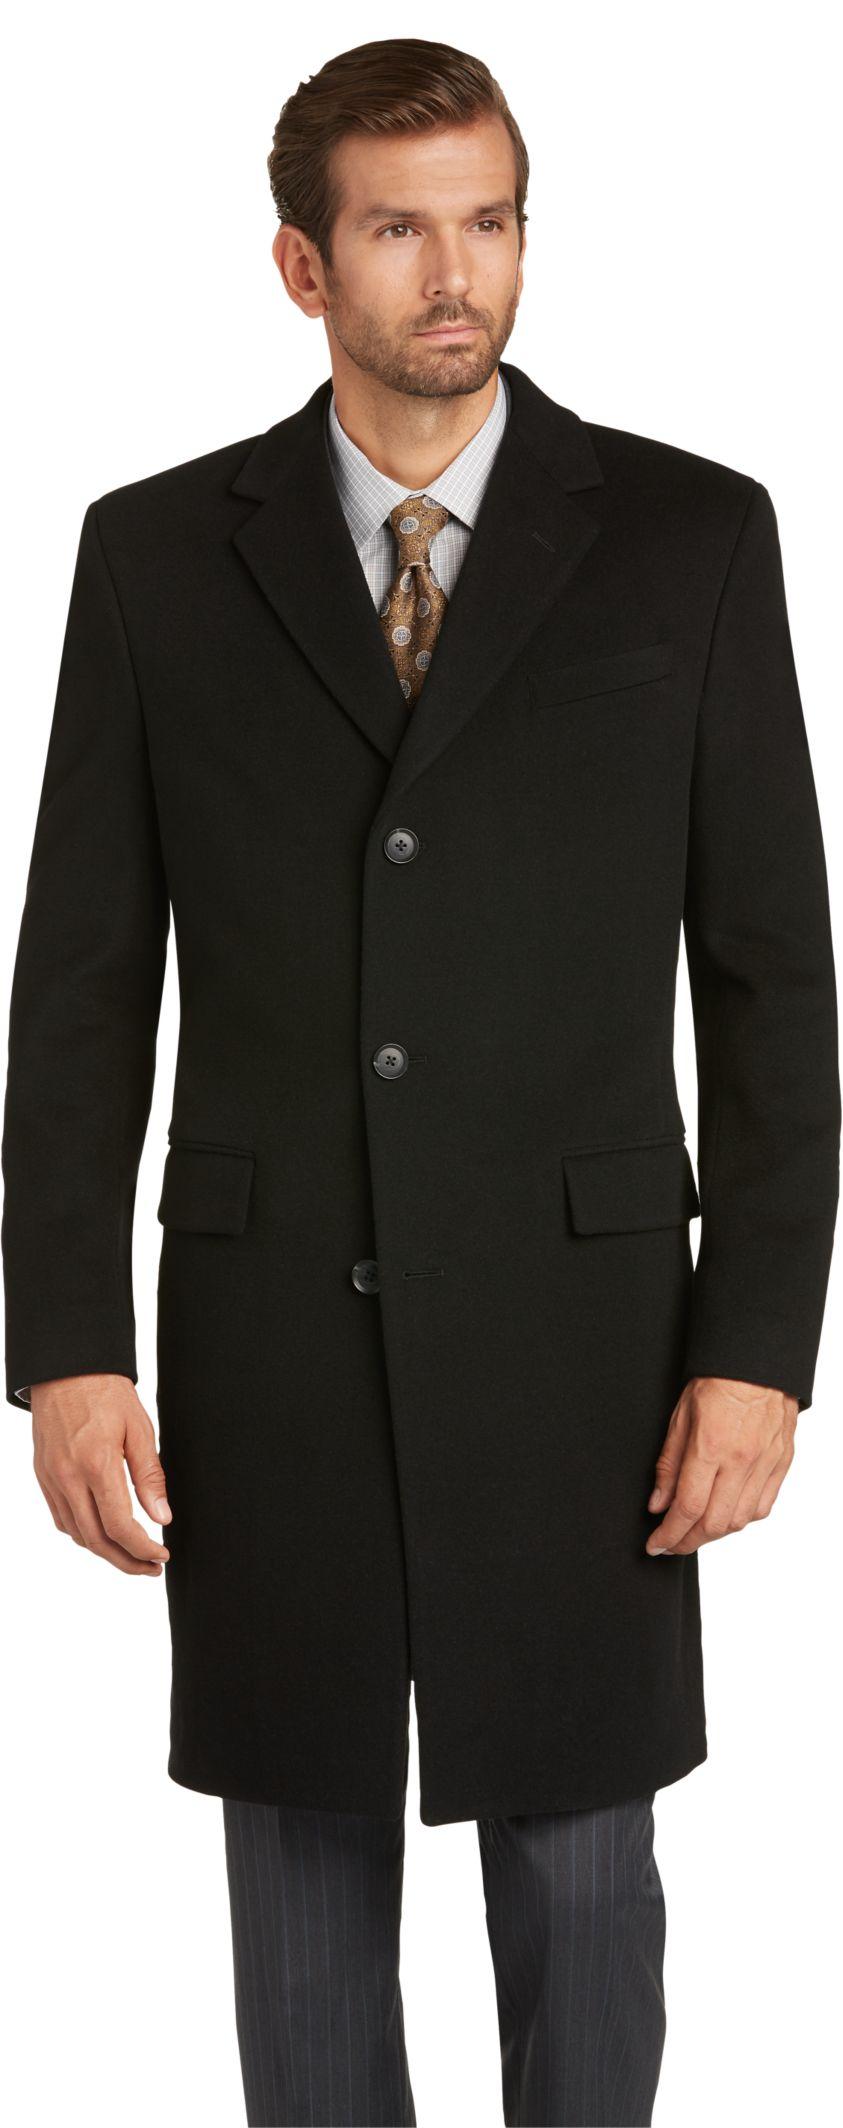 Men's Overcoats & Topcoats | Men's Outerwear | JoS. A. Bank Clothiers